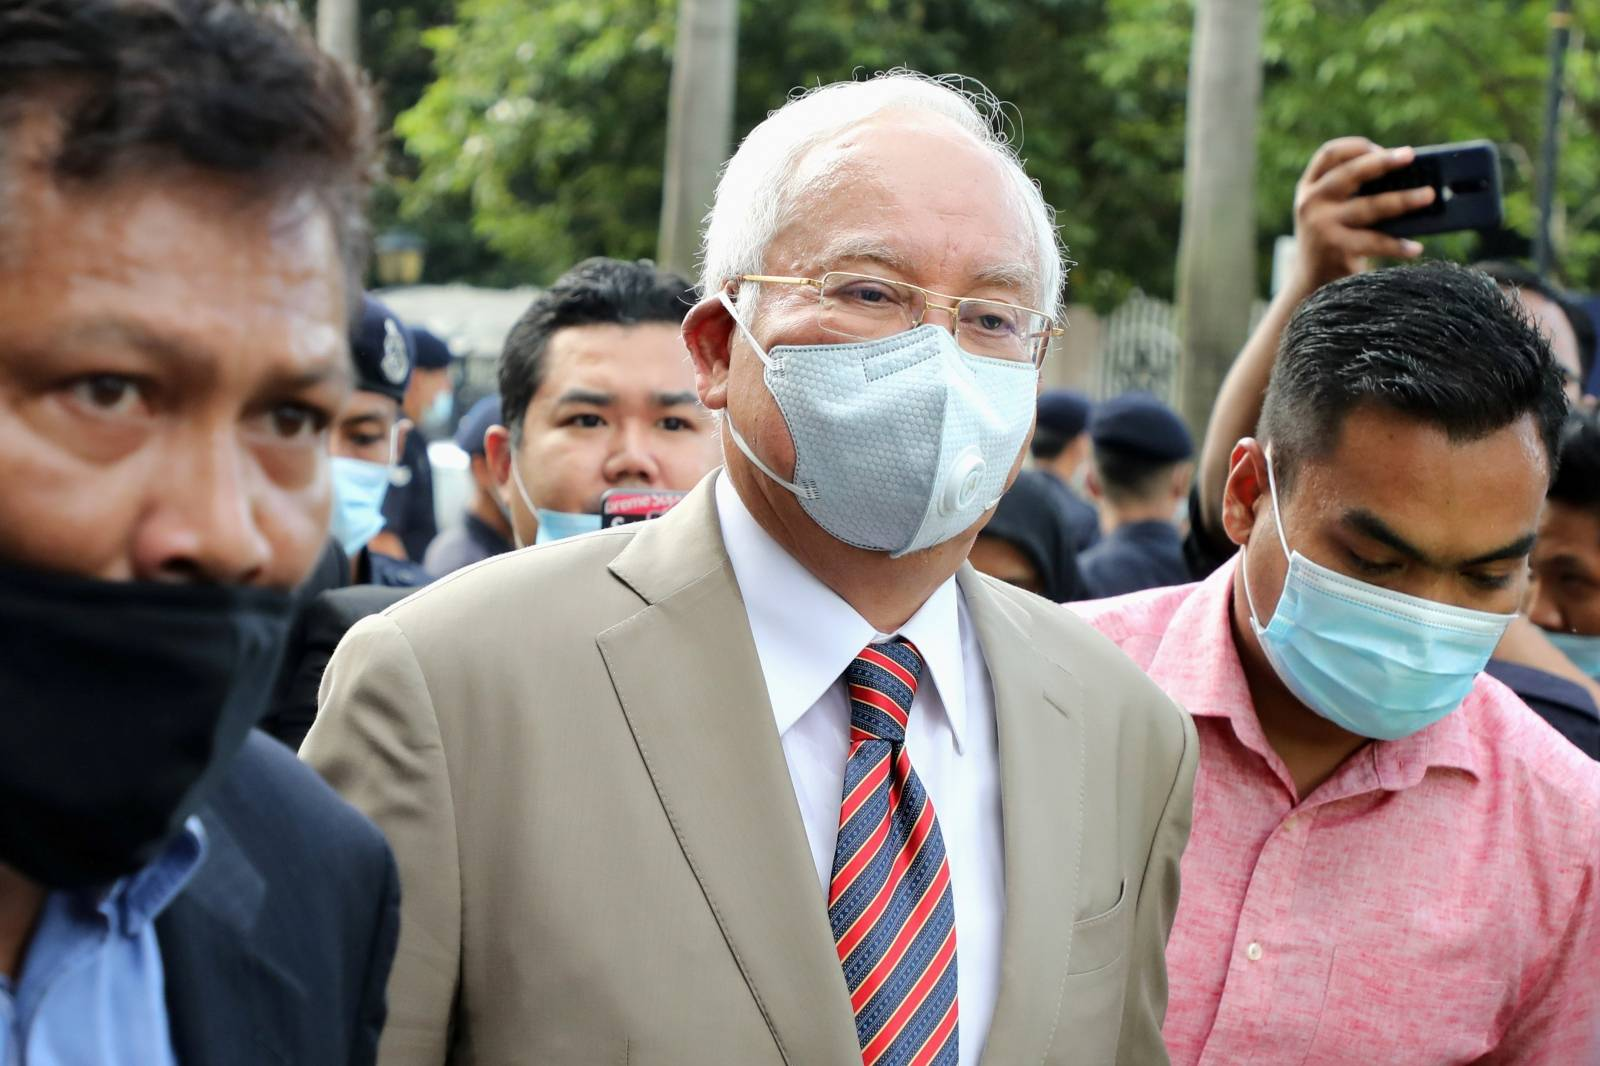 Former Malaysian Prime Minister Najib Razak arrives at Kuala Lumpur High Court in Kuala Lumpur